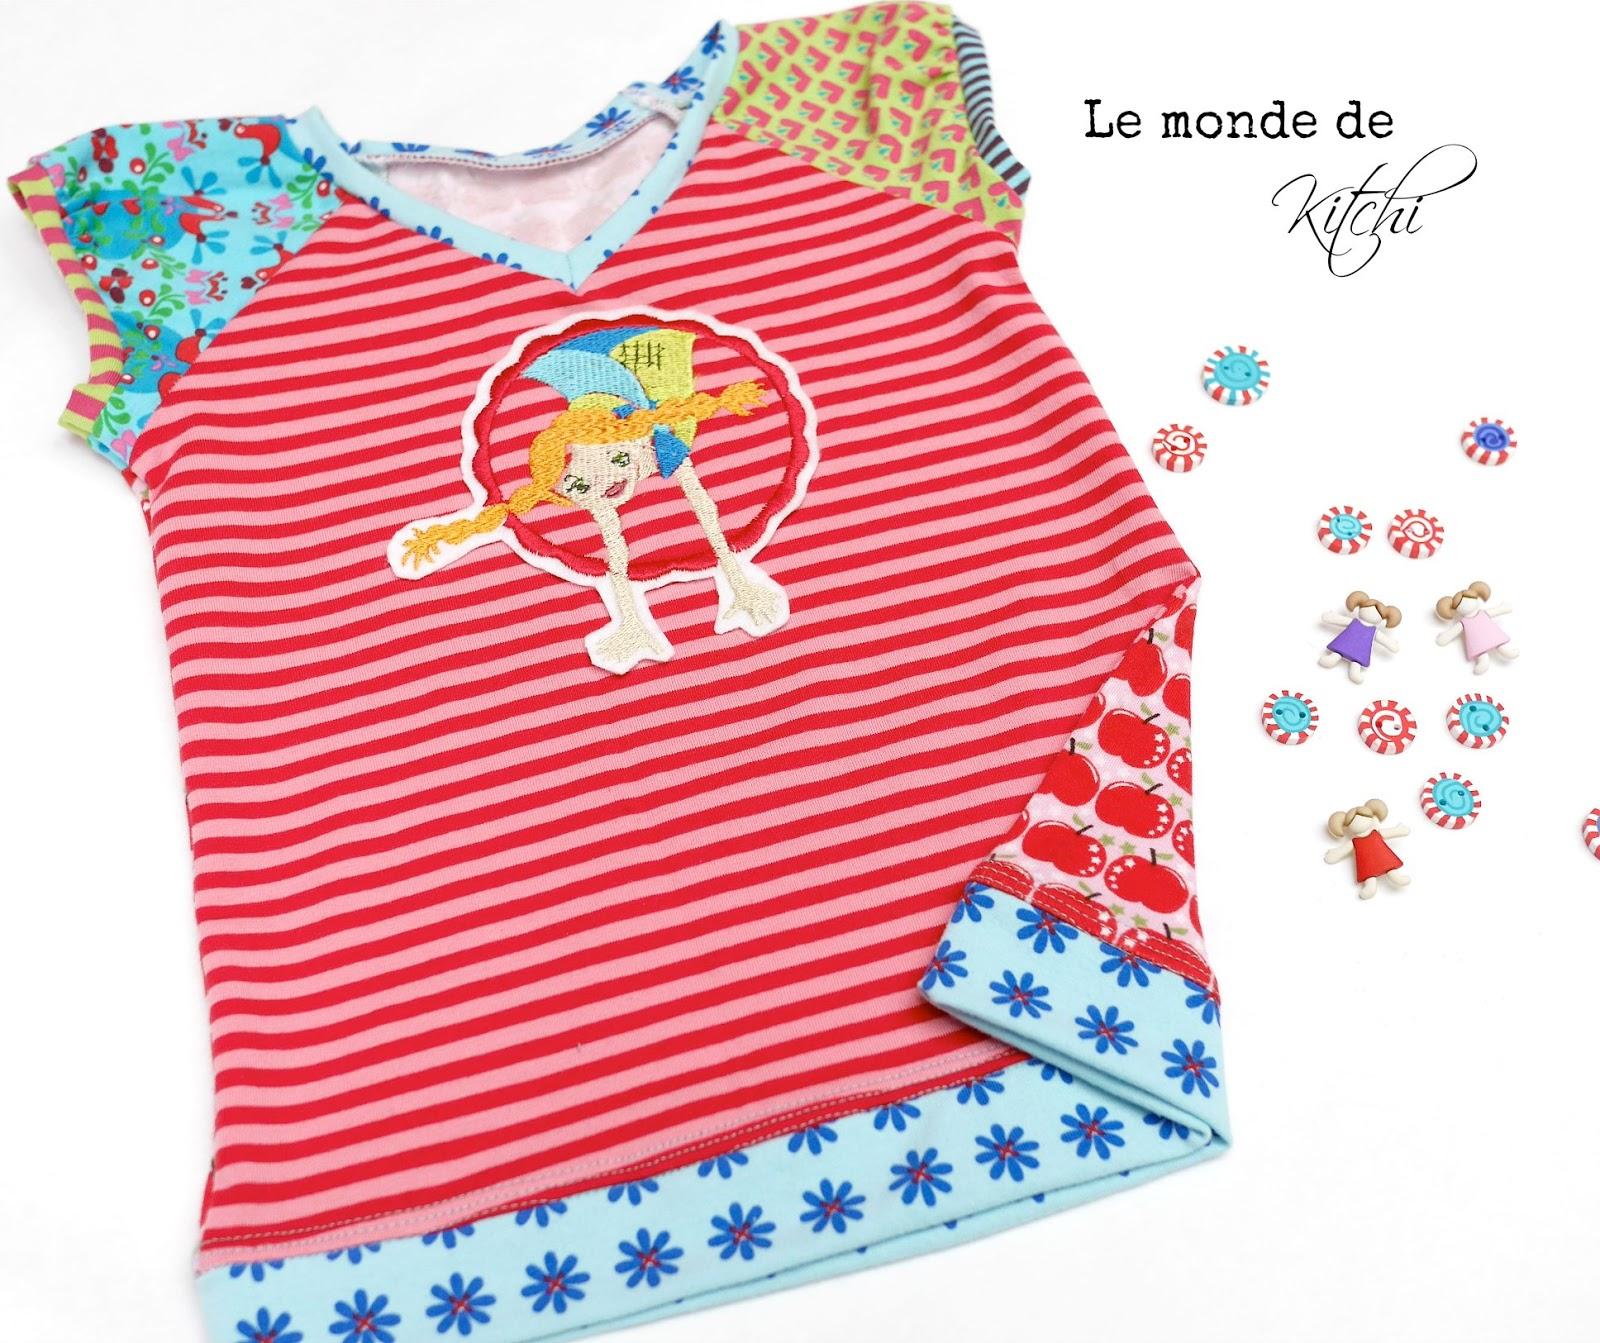 Le monde de Kitchi: Meine T-Shirt - Schnittmuster- Hitparade: Platz 3